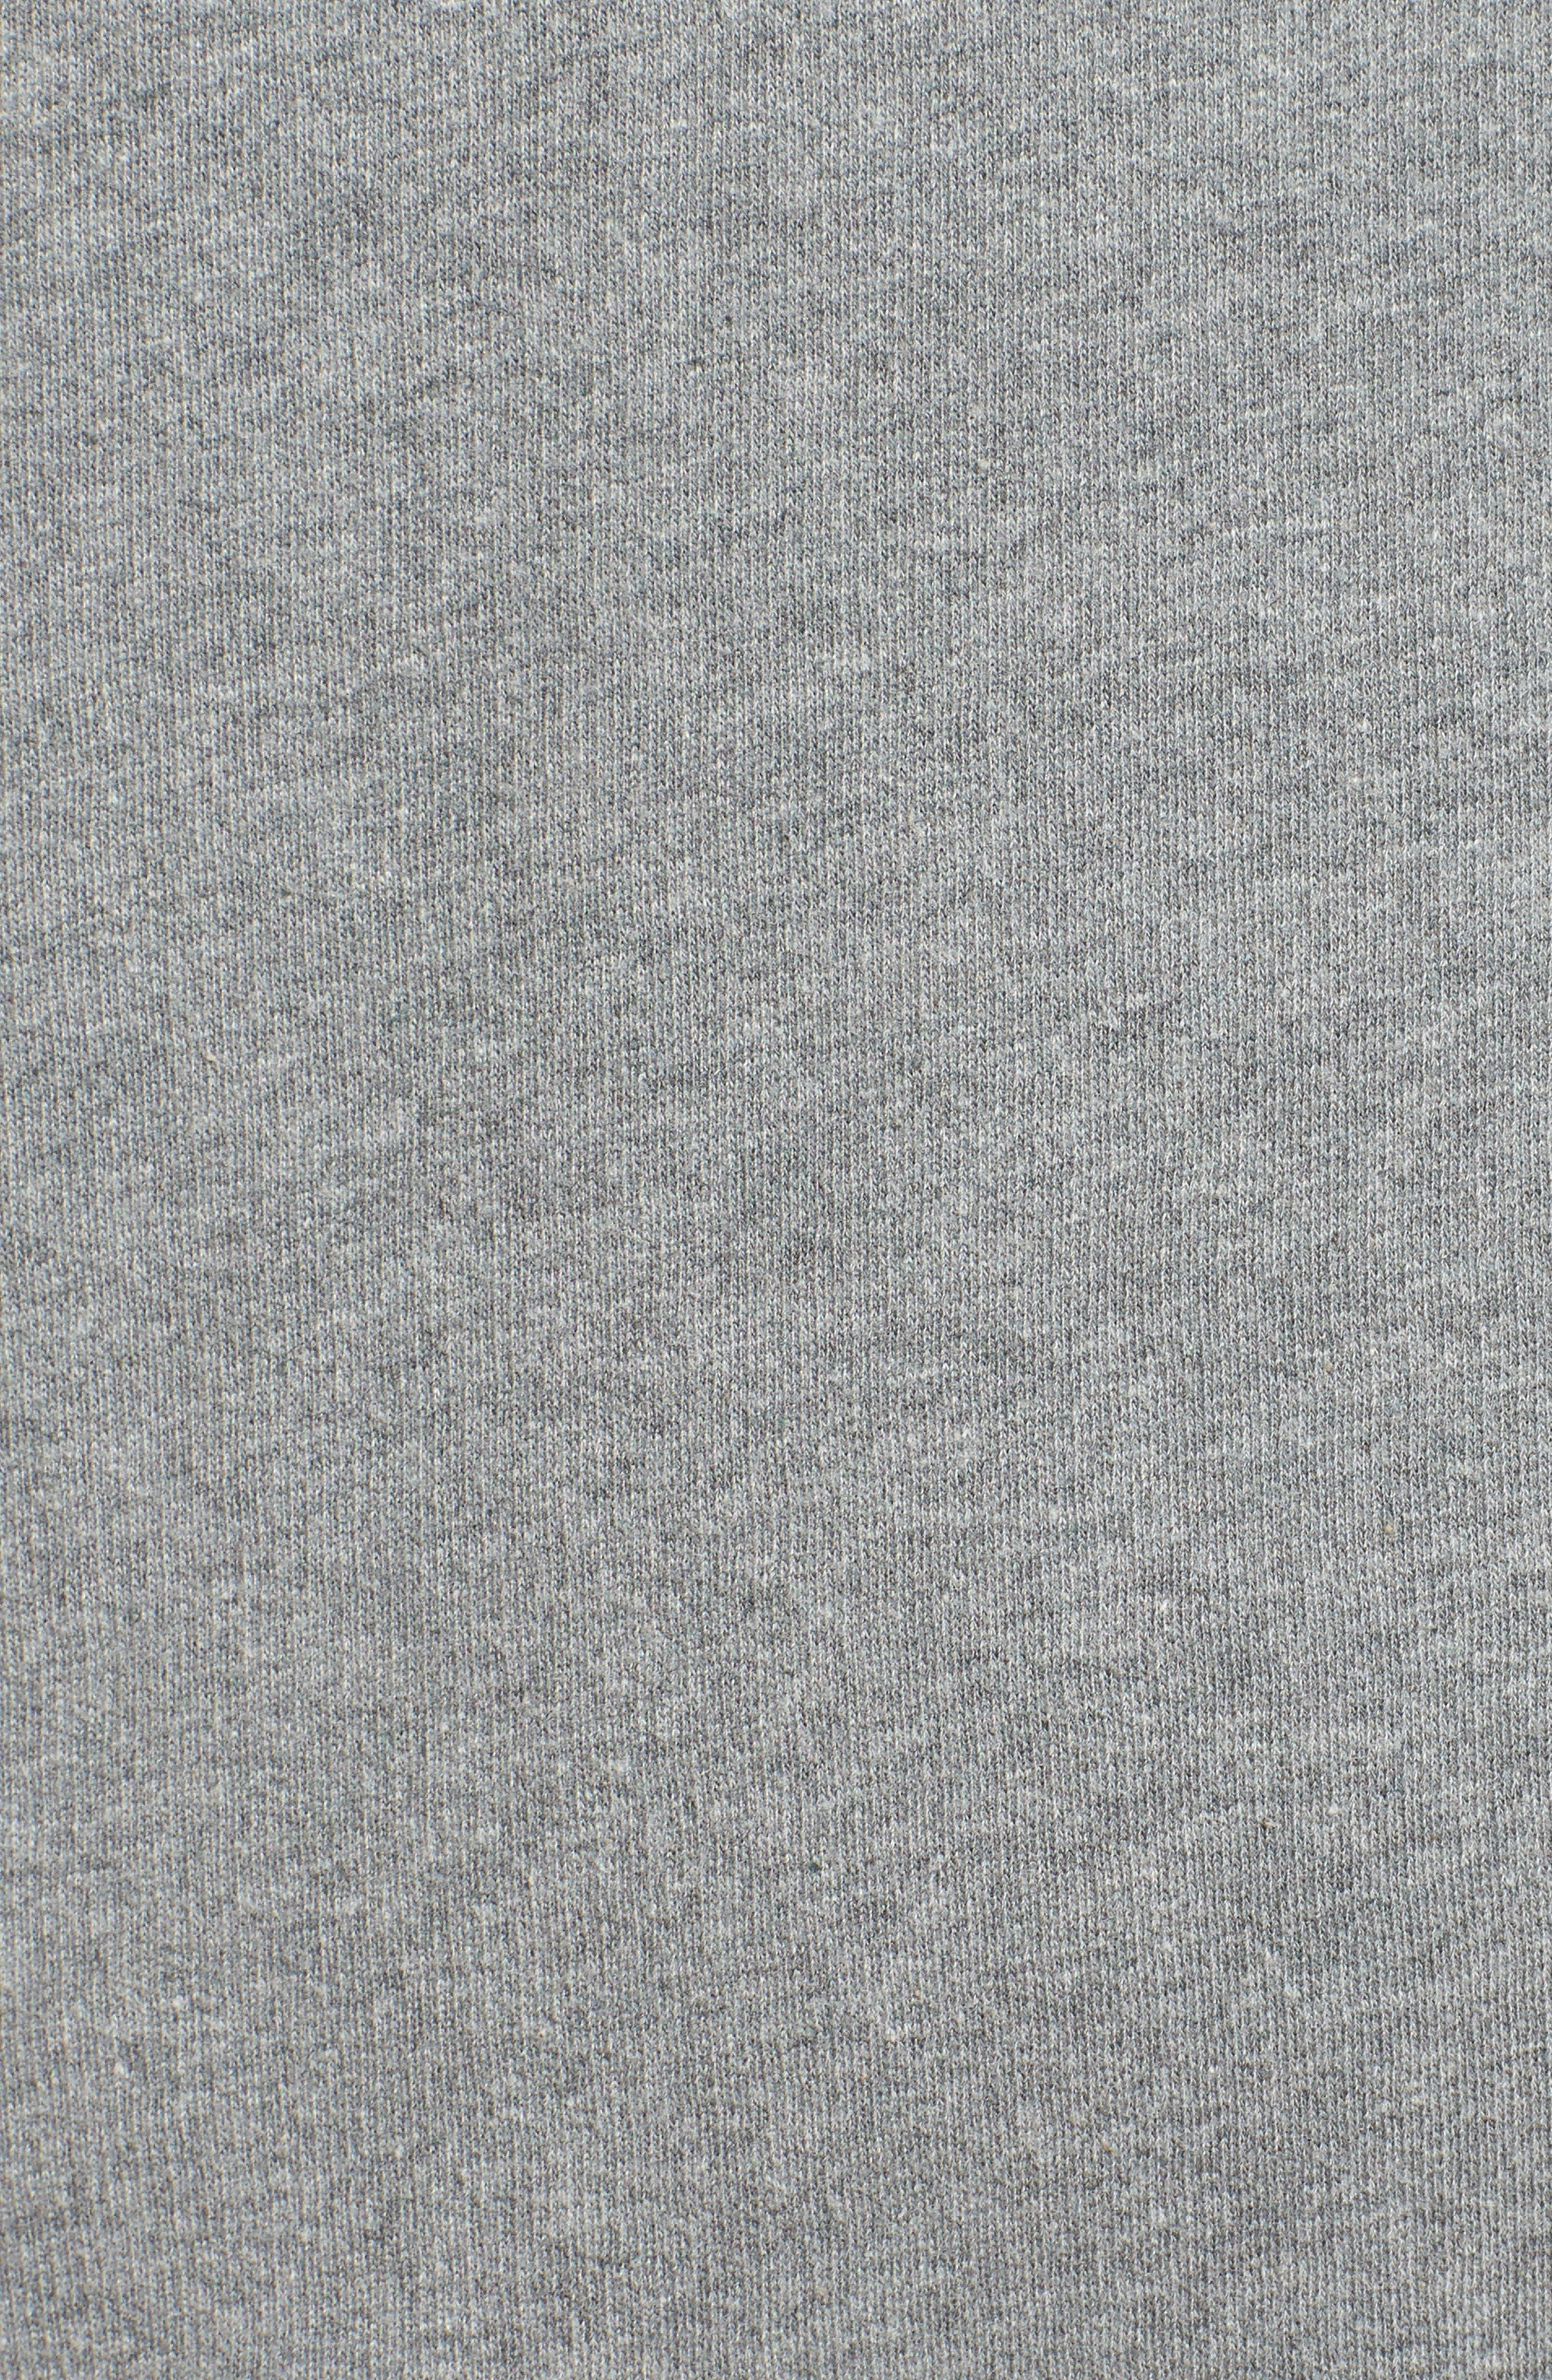 BRUNETTE THE LABEL,                             Boss Babe Lounge Sweatshirt,                             Alternate thumbnail 5, color,                             020